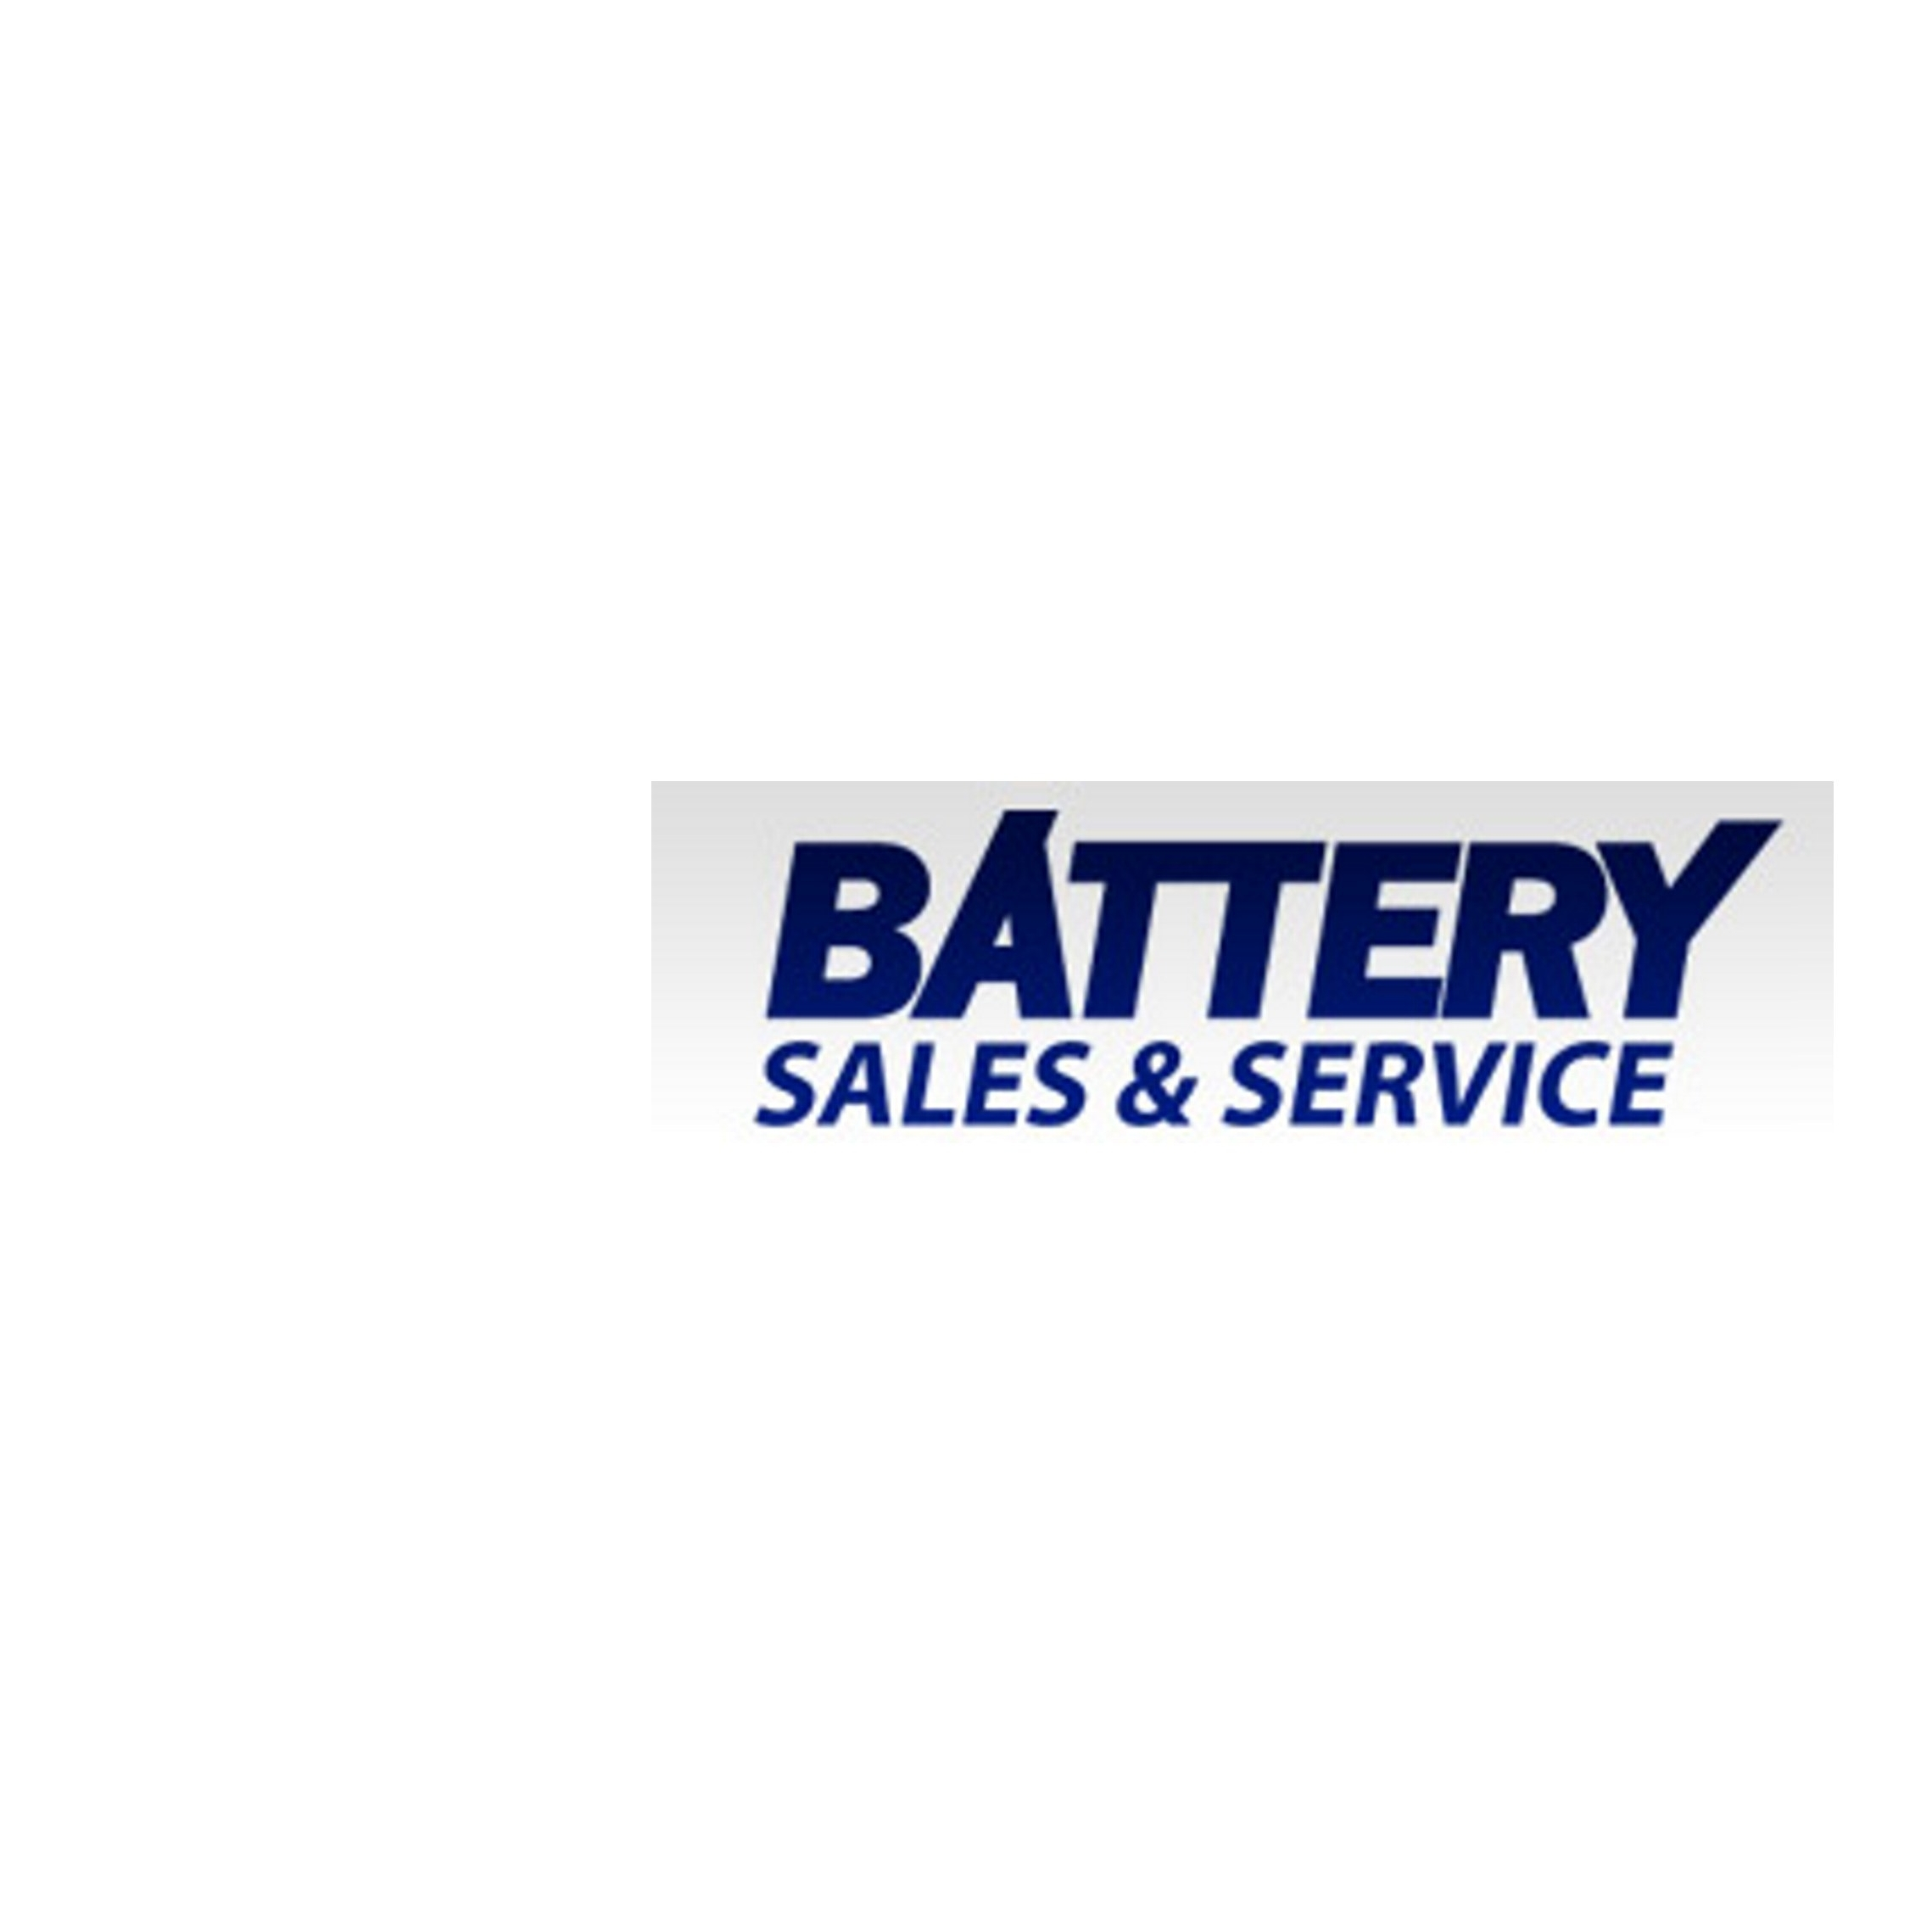 Battery Sales & Service - Battery Store - Atlanta, GA